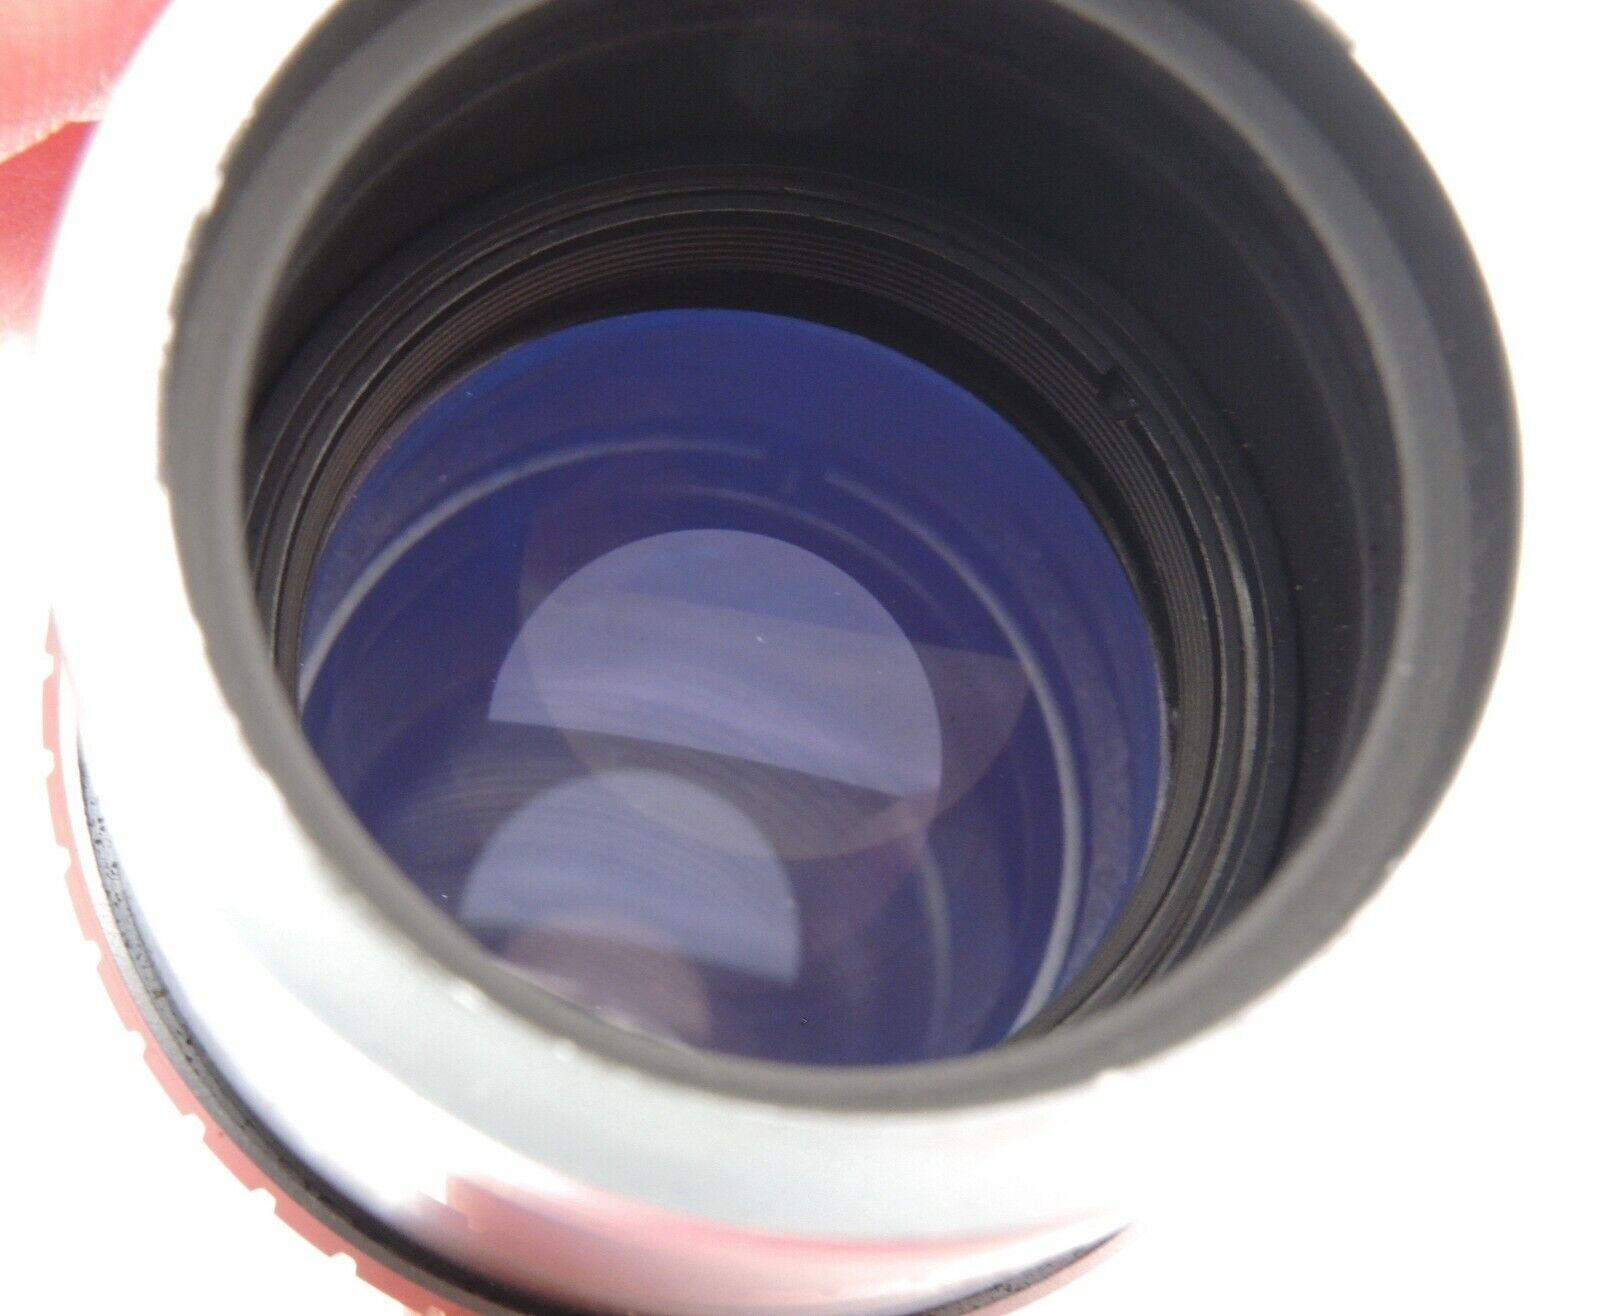 TAYLOR HOBSON COOKE 4 INCH 100mm F4 TELEKINIC C MOUNT LENS ANGENIEUX DALLMEYER - $239.99